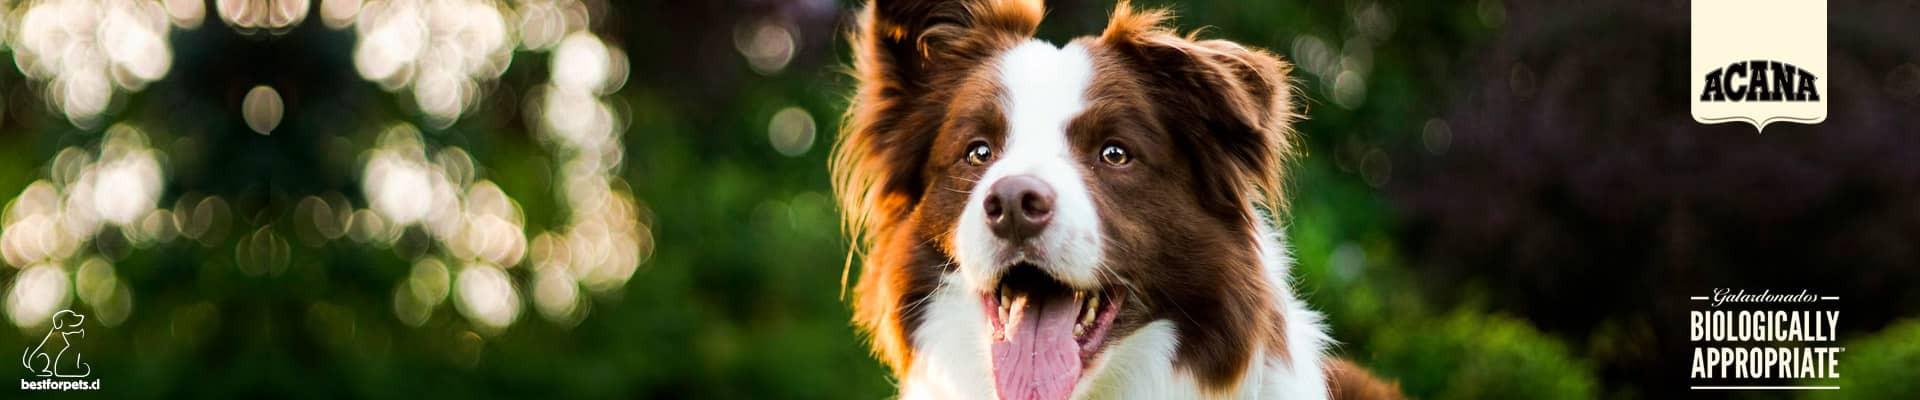 Alimentos Acana para perros